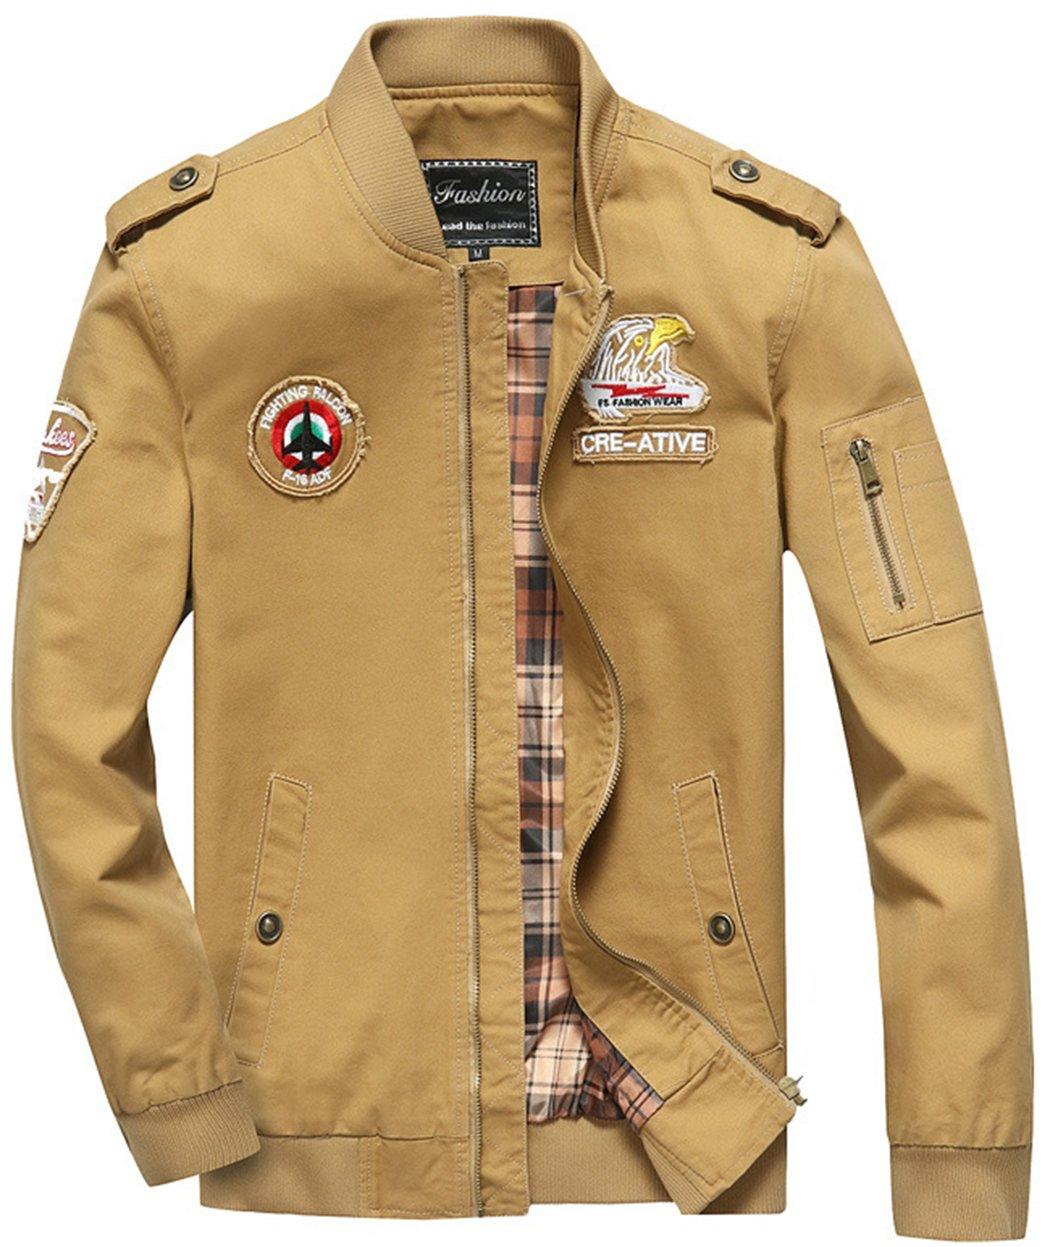 Sawadikaa Men's Military Cotton Lightweight Jacket Windbreaker Wind Trench Coat Bomber Jacket Khaki Large by Sawadikaa